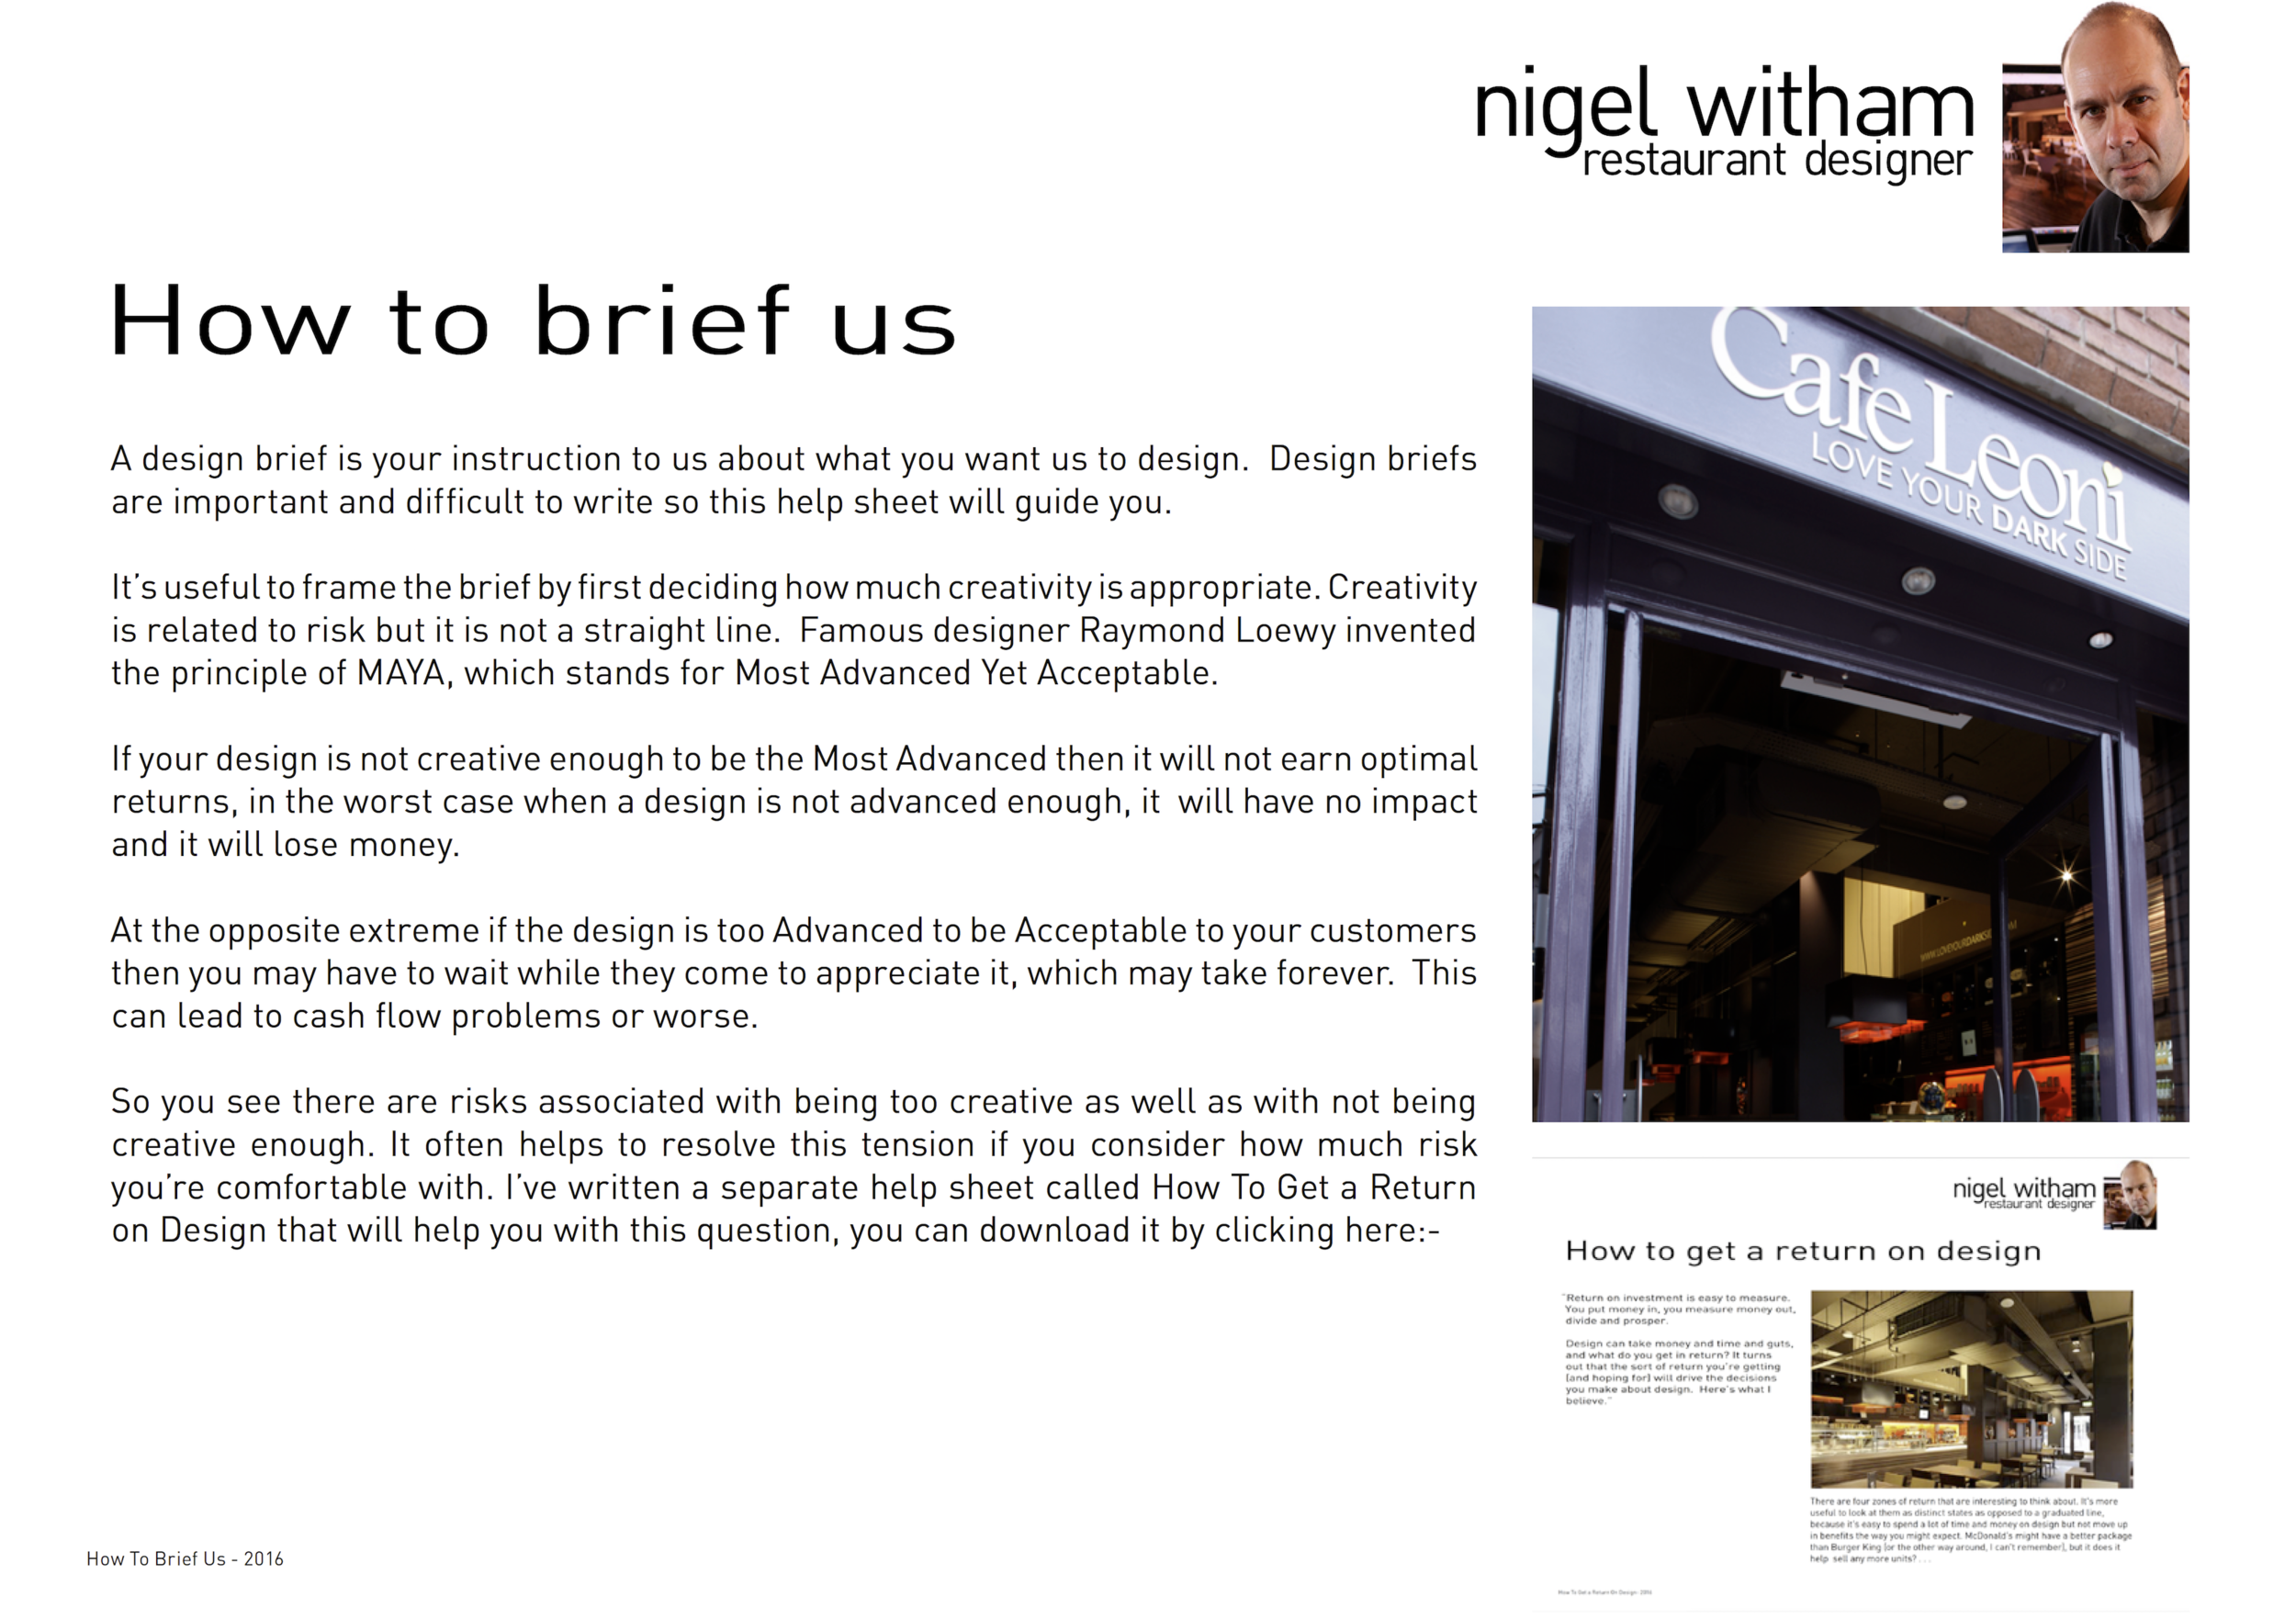 How To Brief Us-©-nigel-witham-restaurant-designer.png